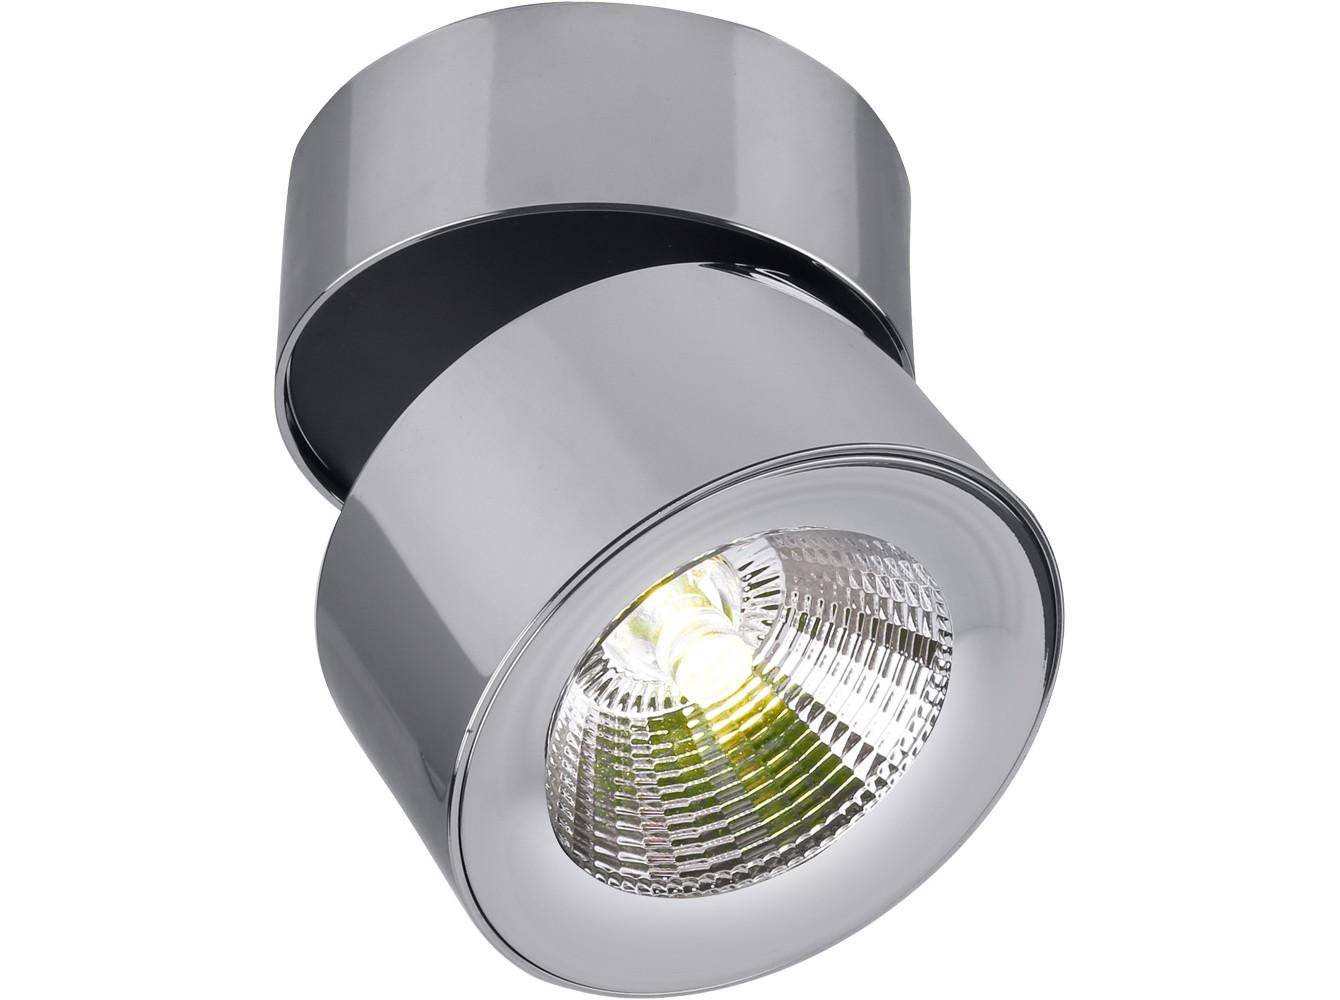 СпотСпоты<br>&amp;lt;div&amp;gt;Вид цоколя: LED&amp;lt;/div&amp;gt;&amp;lt;div&amp;gt;Мощность ламп: 10W (эквивалент 100W)&amp;lt;/div&amp;gt;&amp;lt;div&amp;gt;Количество ламп: 1&amp;lt;/div&amp;gt;&amp;lt;div&amp;gt;Наличие ламп: да&amp;lt;/div&amp;gt;<br><br>Material: Металл<br>Высота см: 9